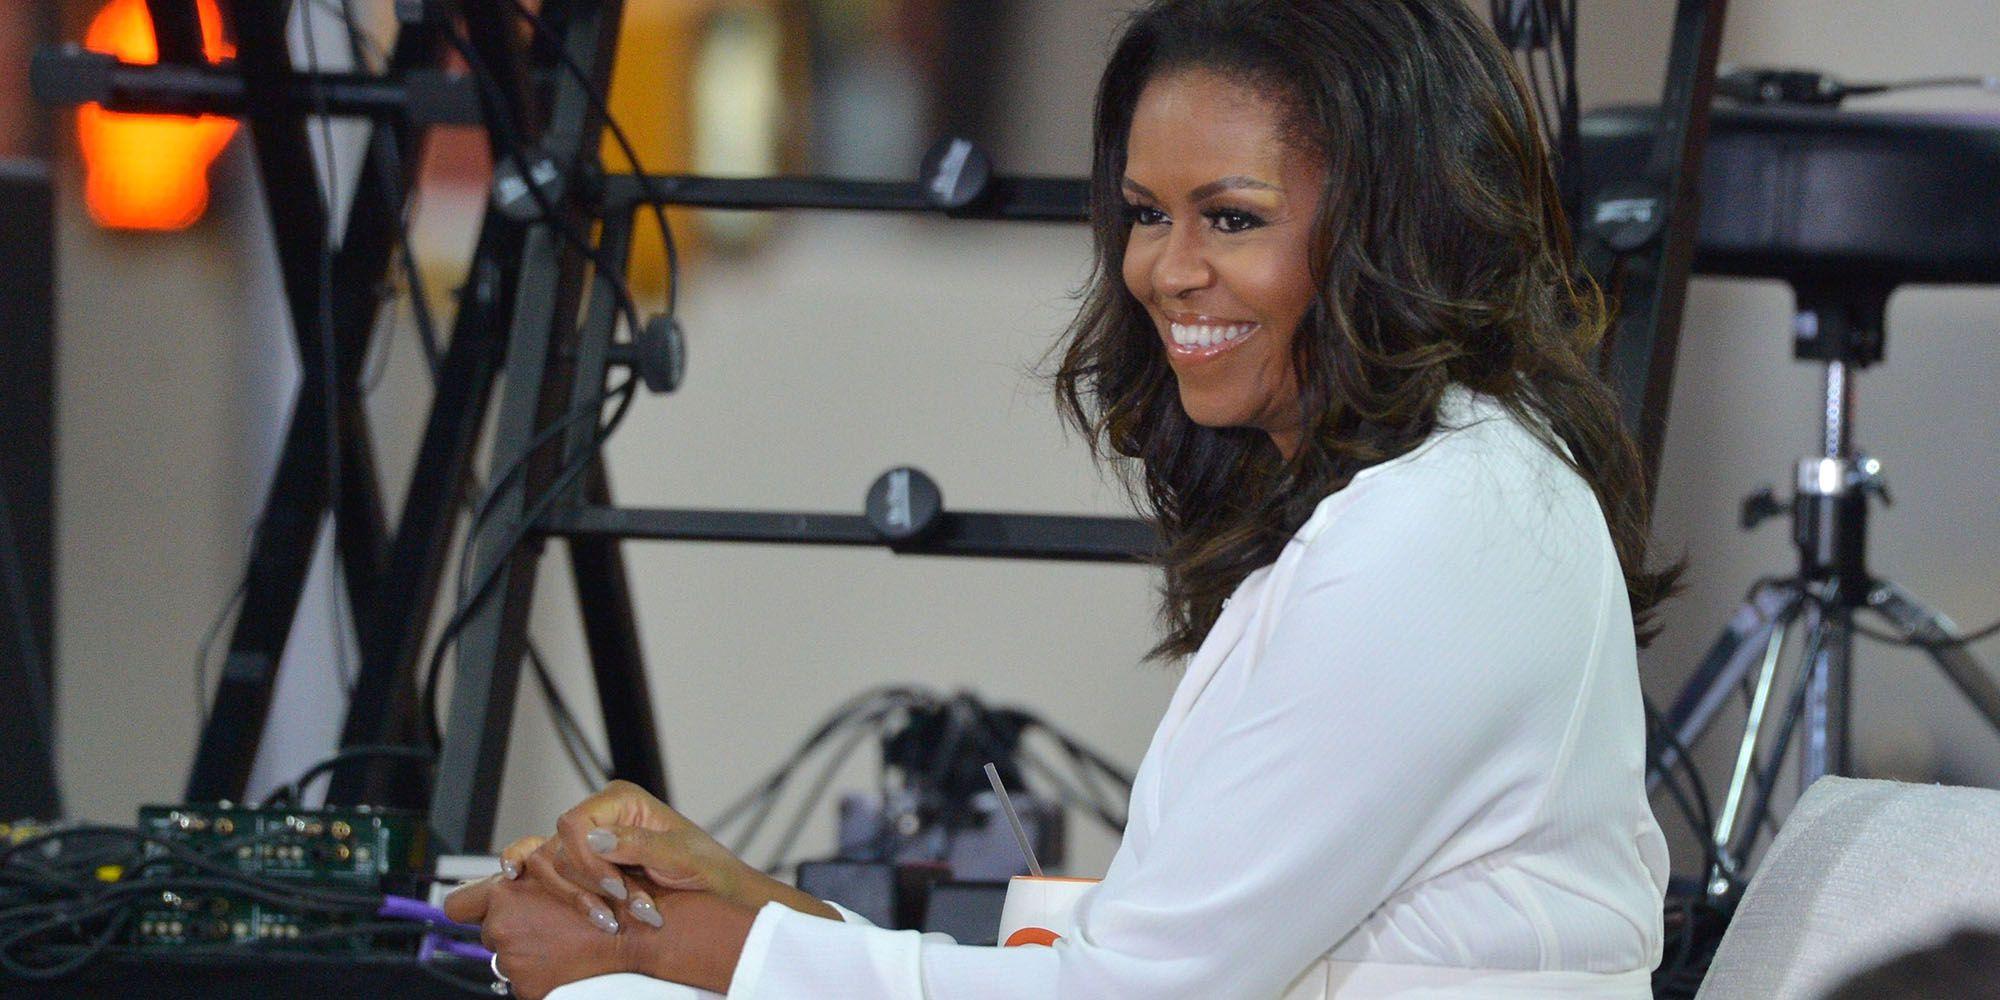 #MeToo 運動一年過去了!前美總統夫人米雪兒歐巴馬:「我們正在為下一代鋪正確的道路」